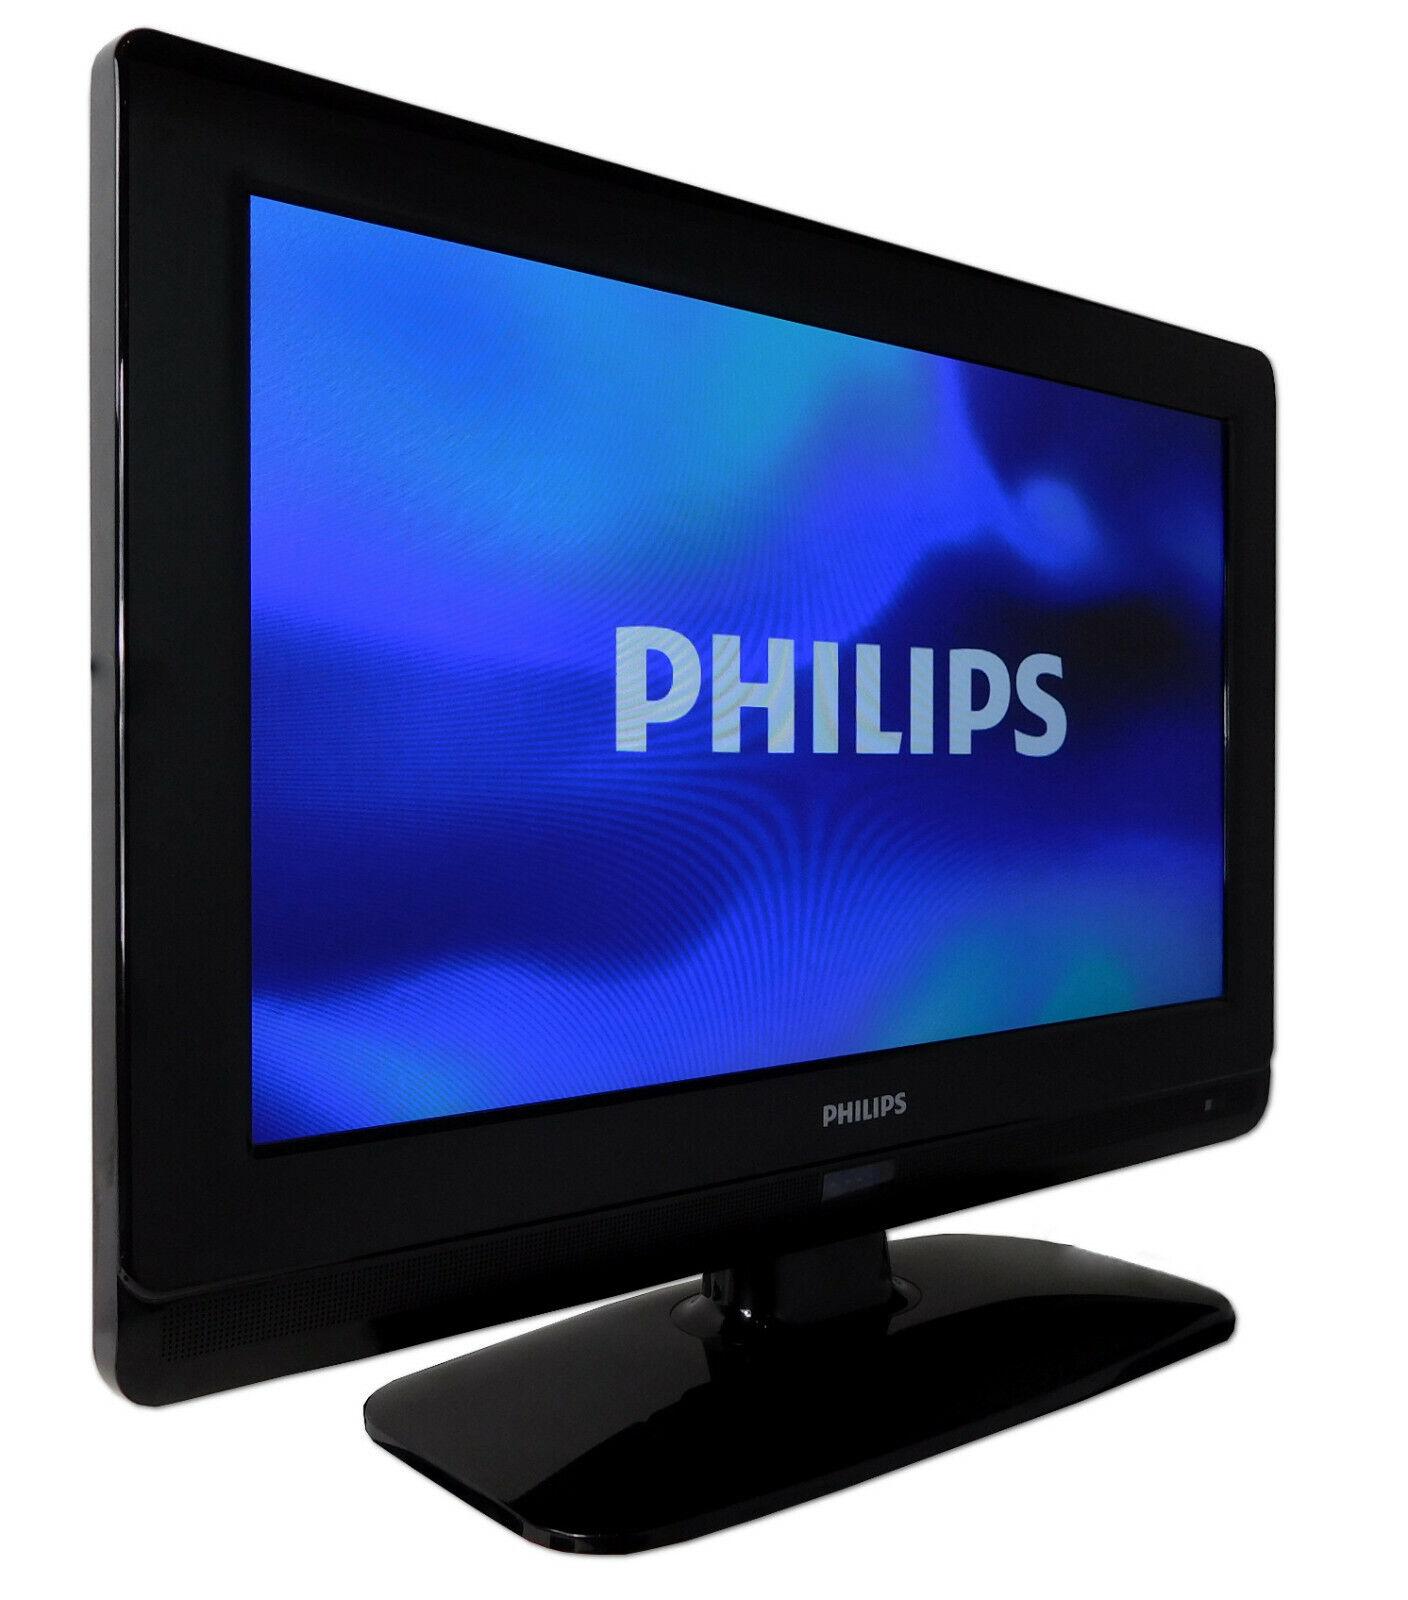 PHILIPS 66 cm (26 Zoll) Fernseher LED-LCD Digital TV mit DVB-C HDMI USB CI MPEG4